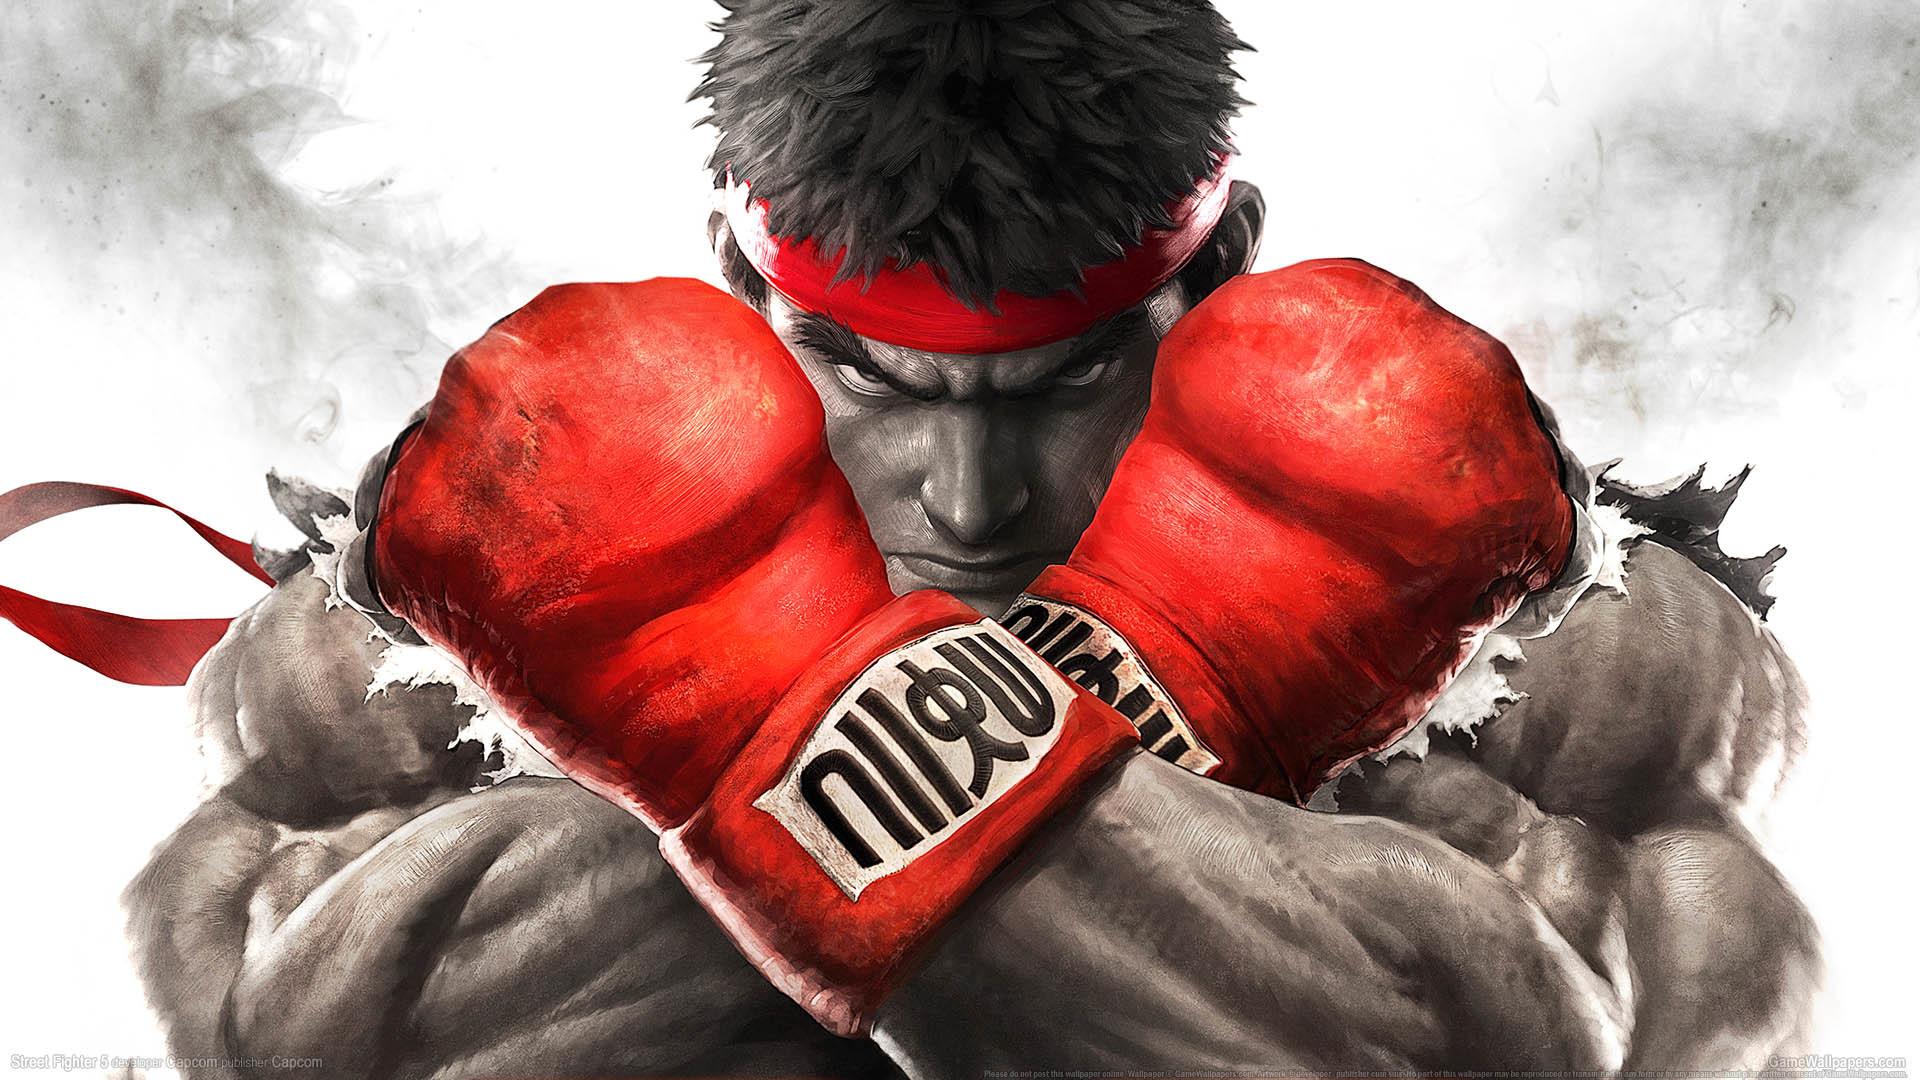 Street Fighter 5 wallpaper 01 1920×1080